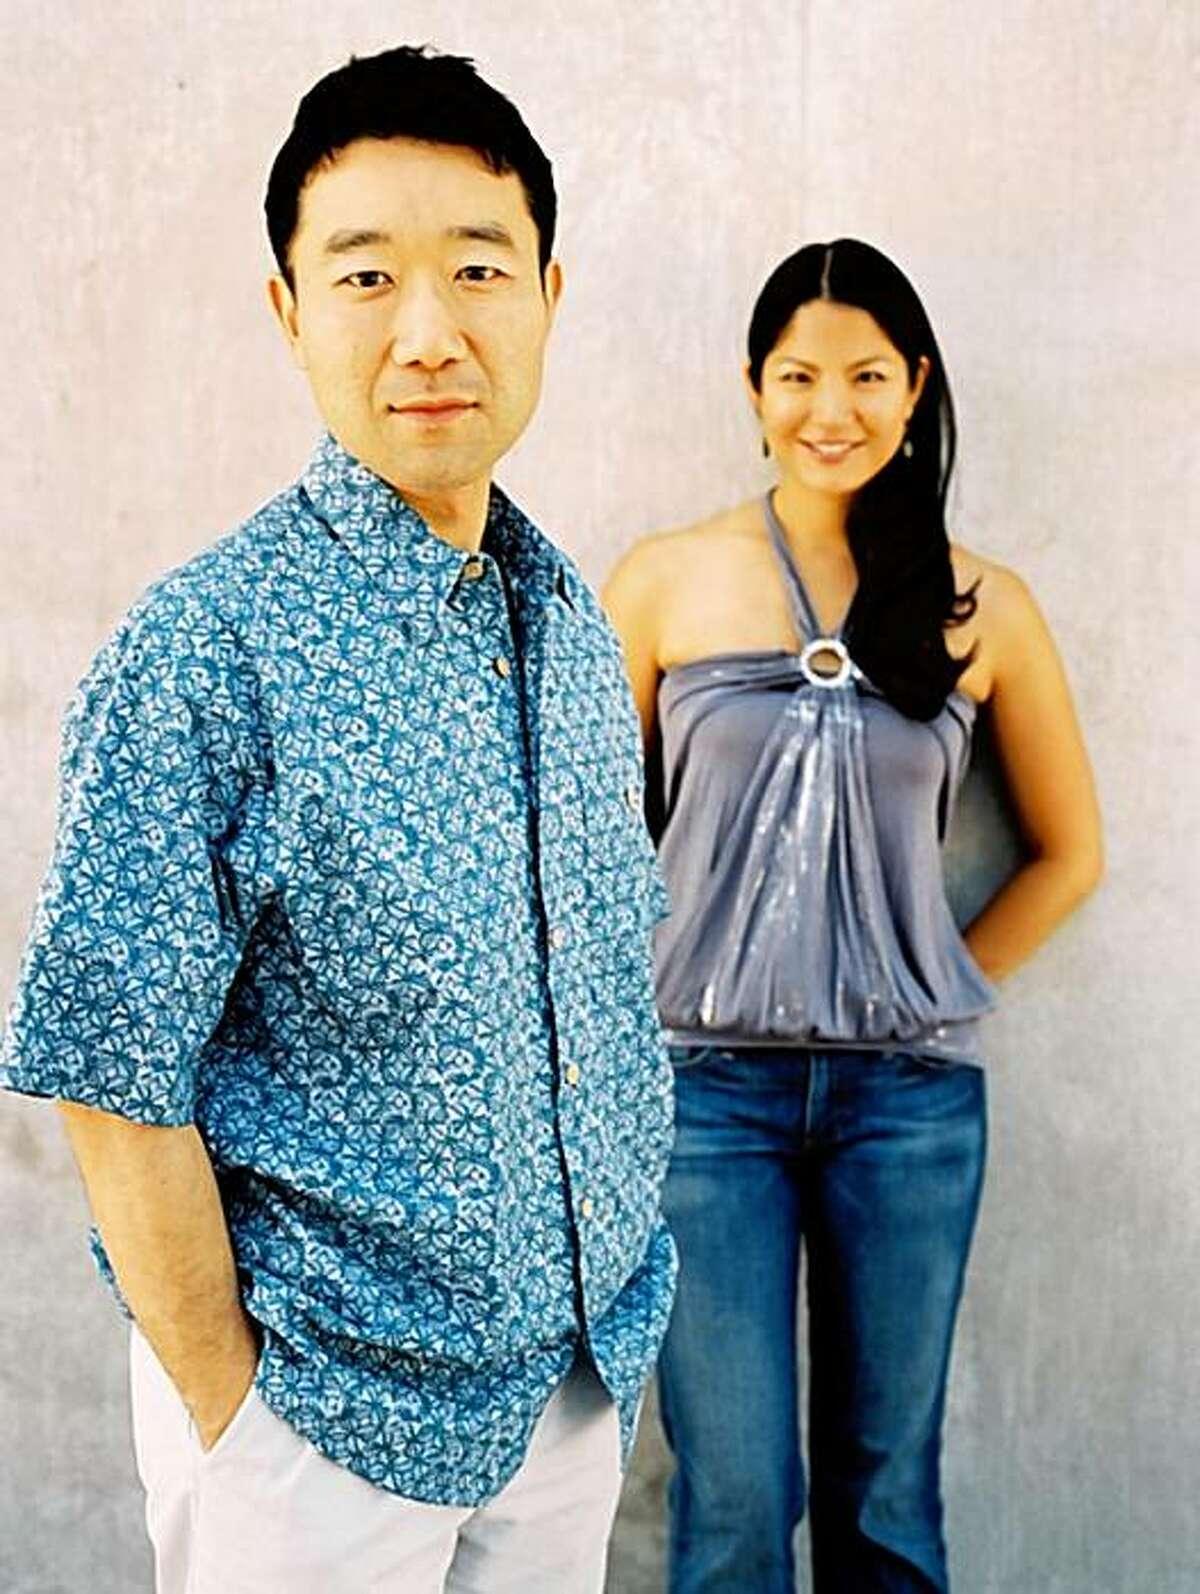 Jimmy (Hiroshi Watanabe) and the object of his desire, Ramona (Lynn Chen), in David Boyle's film